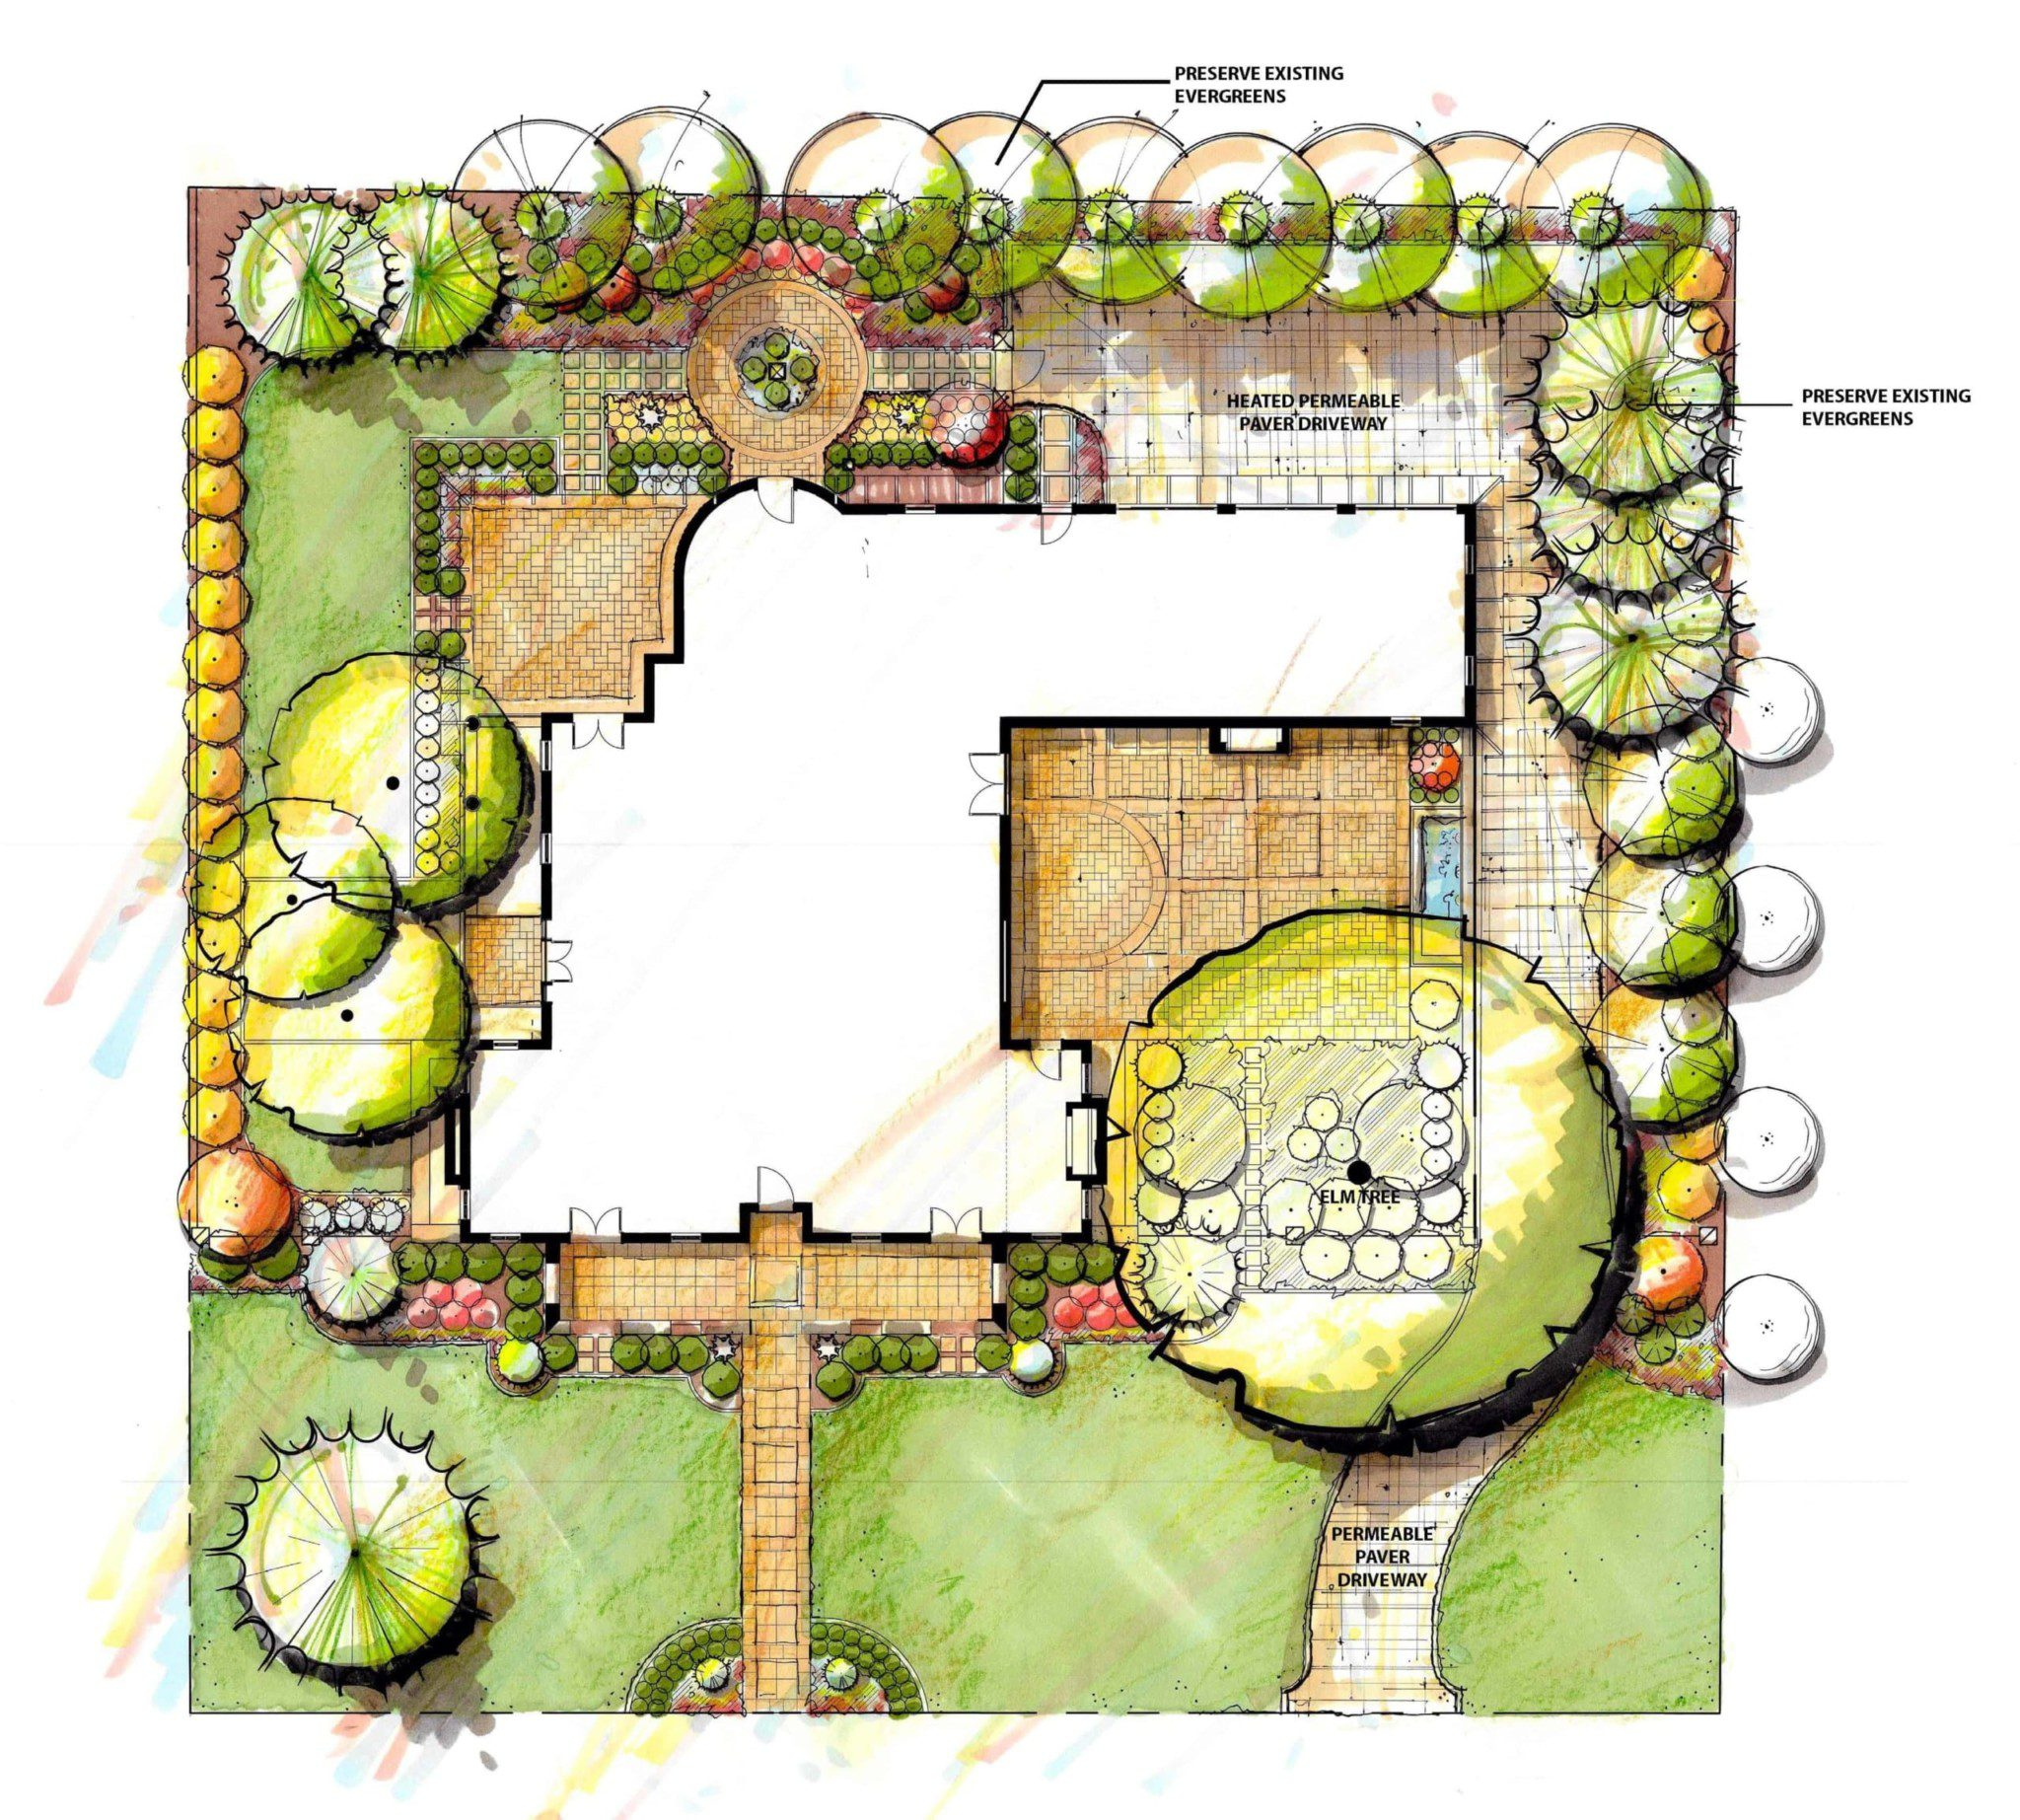 15-Polo Club Villa Landscape Plan